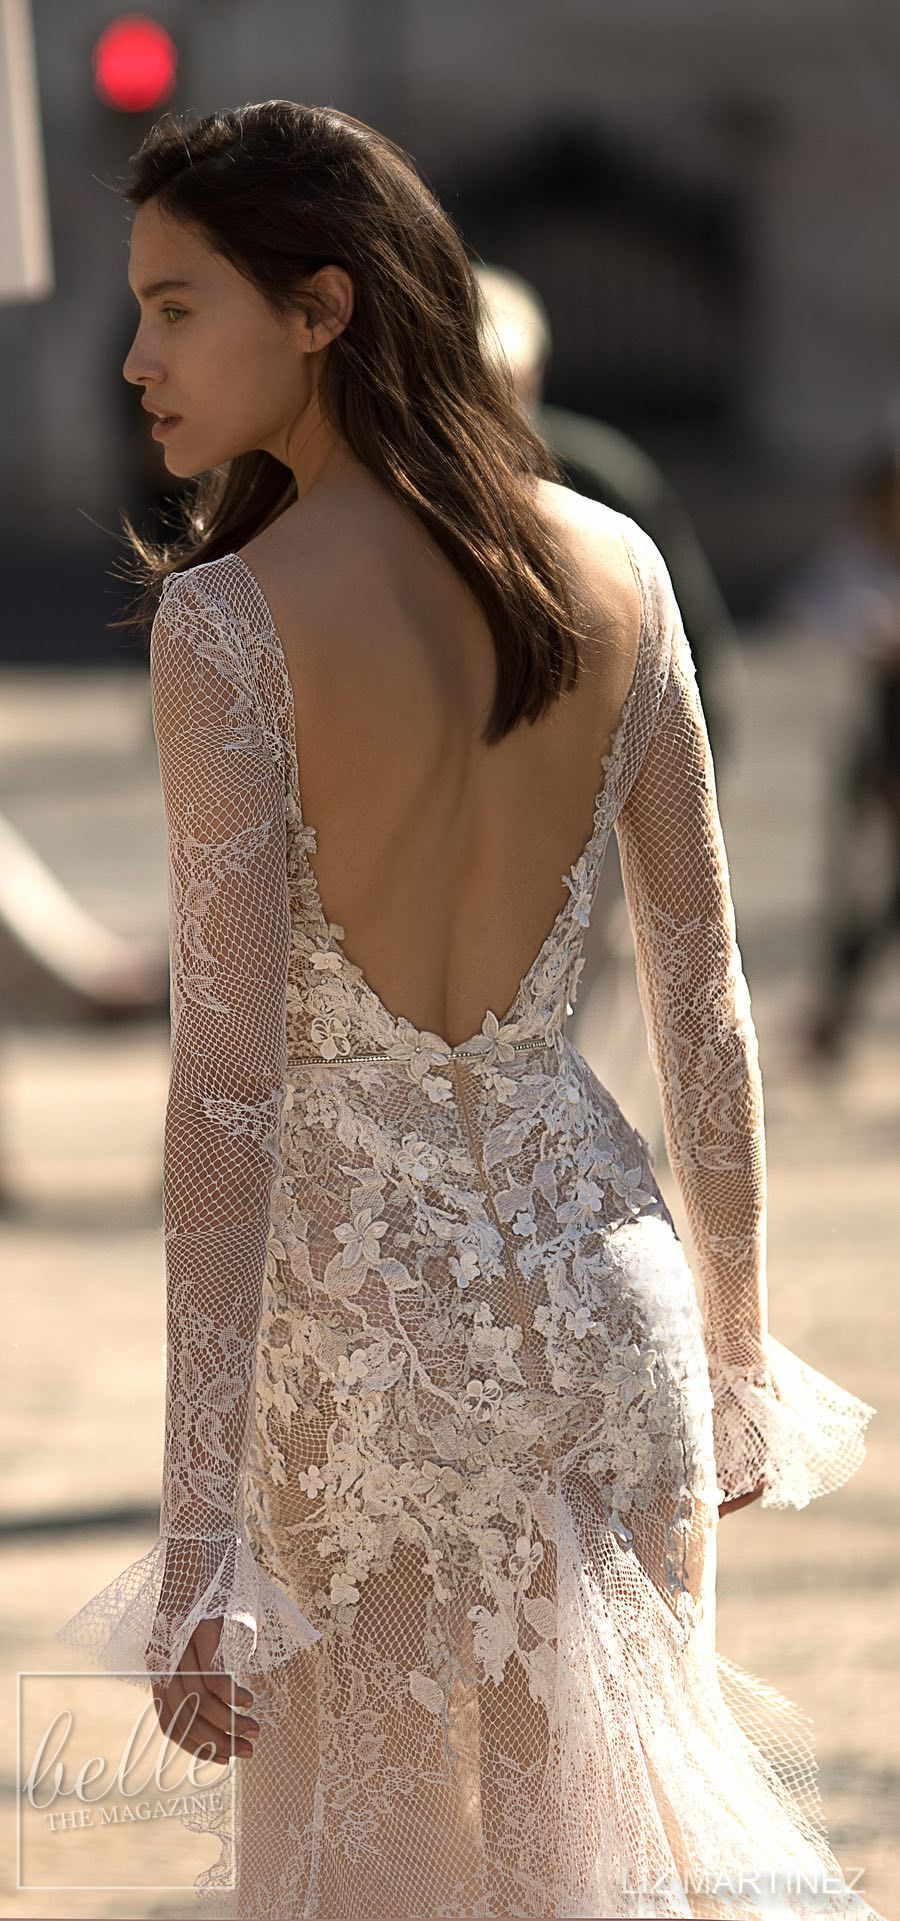 Wedding dresses by liz martinez bridal collection wedding